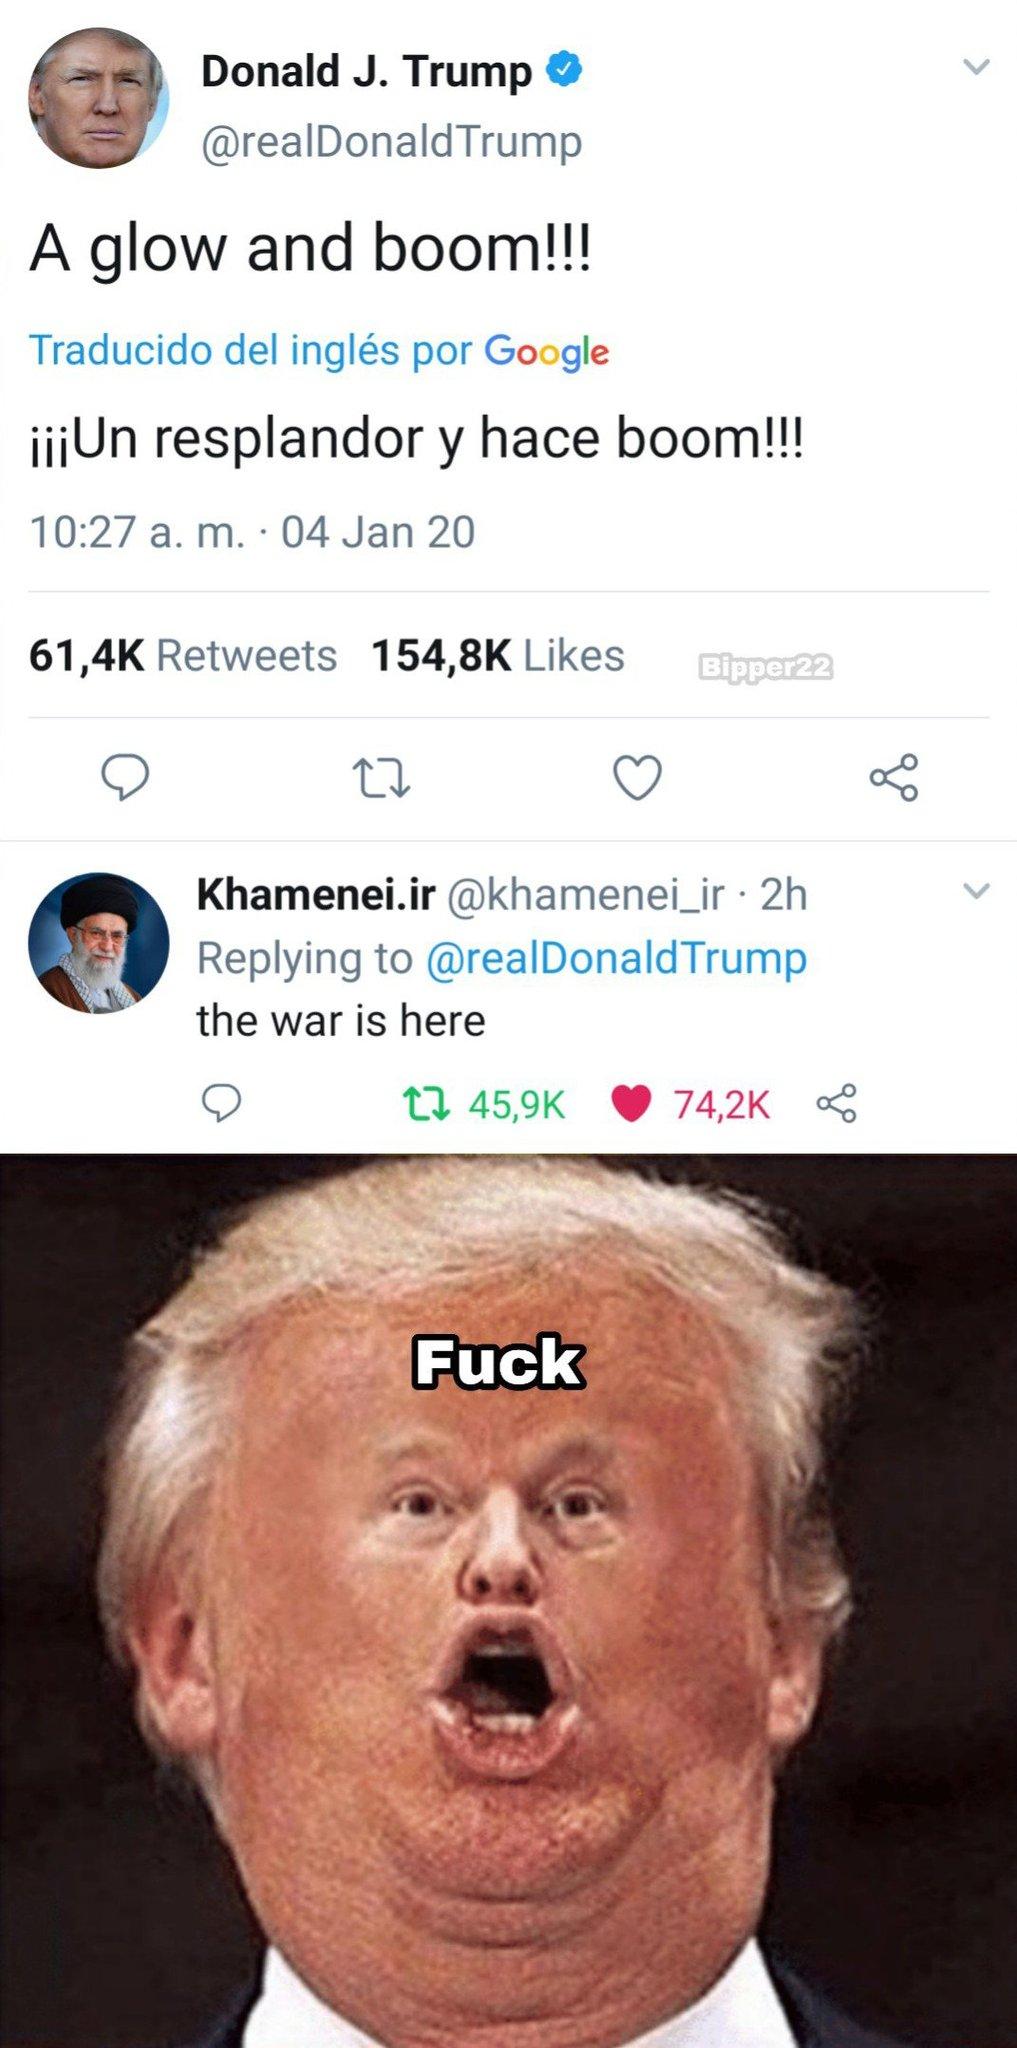 Y hace boom - meme